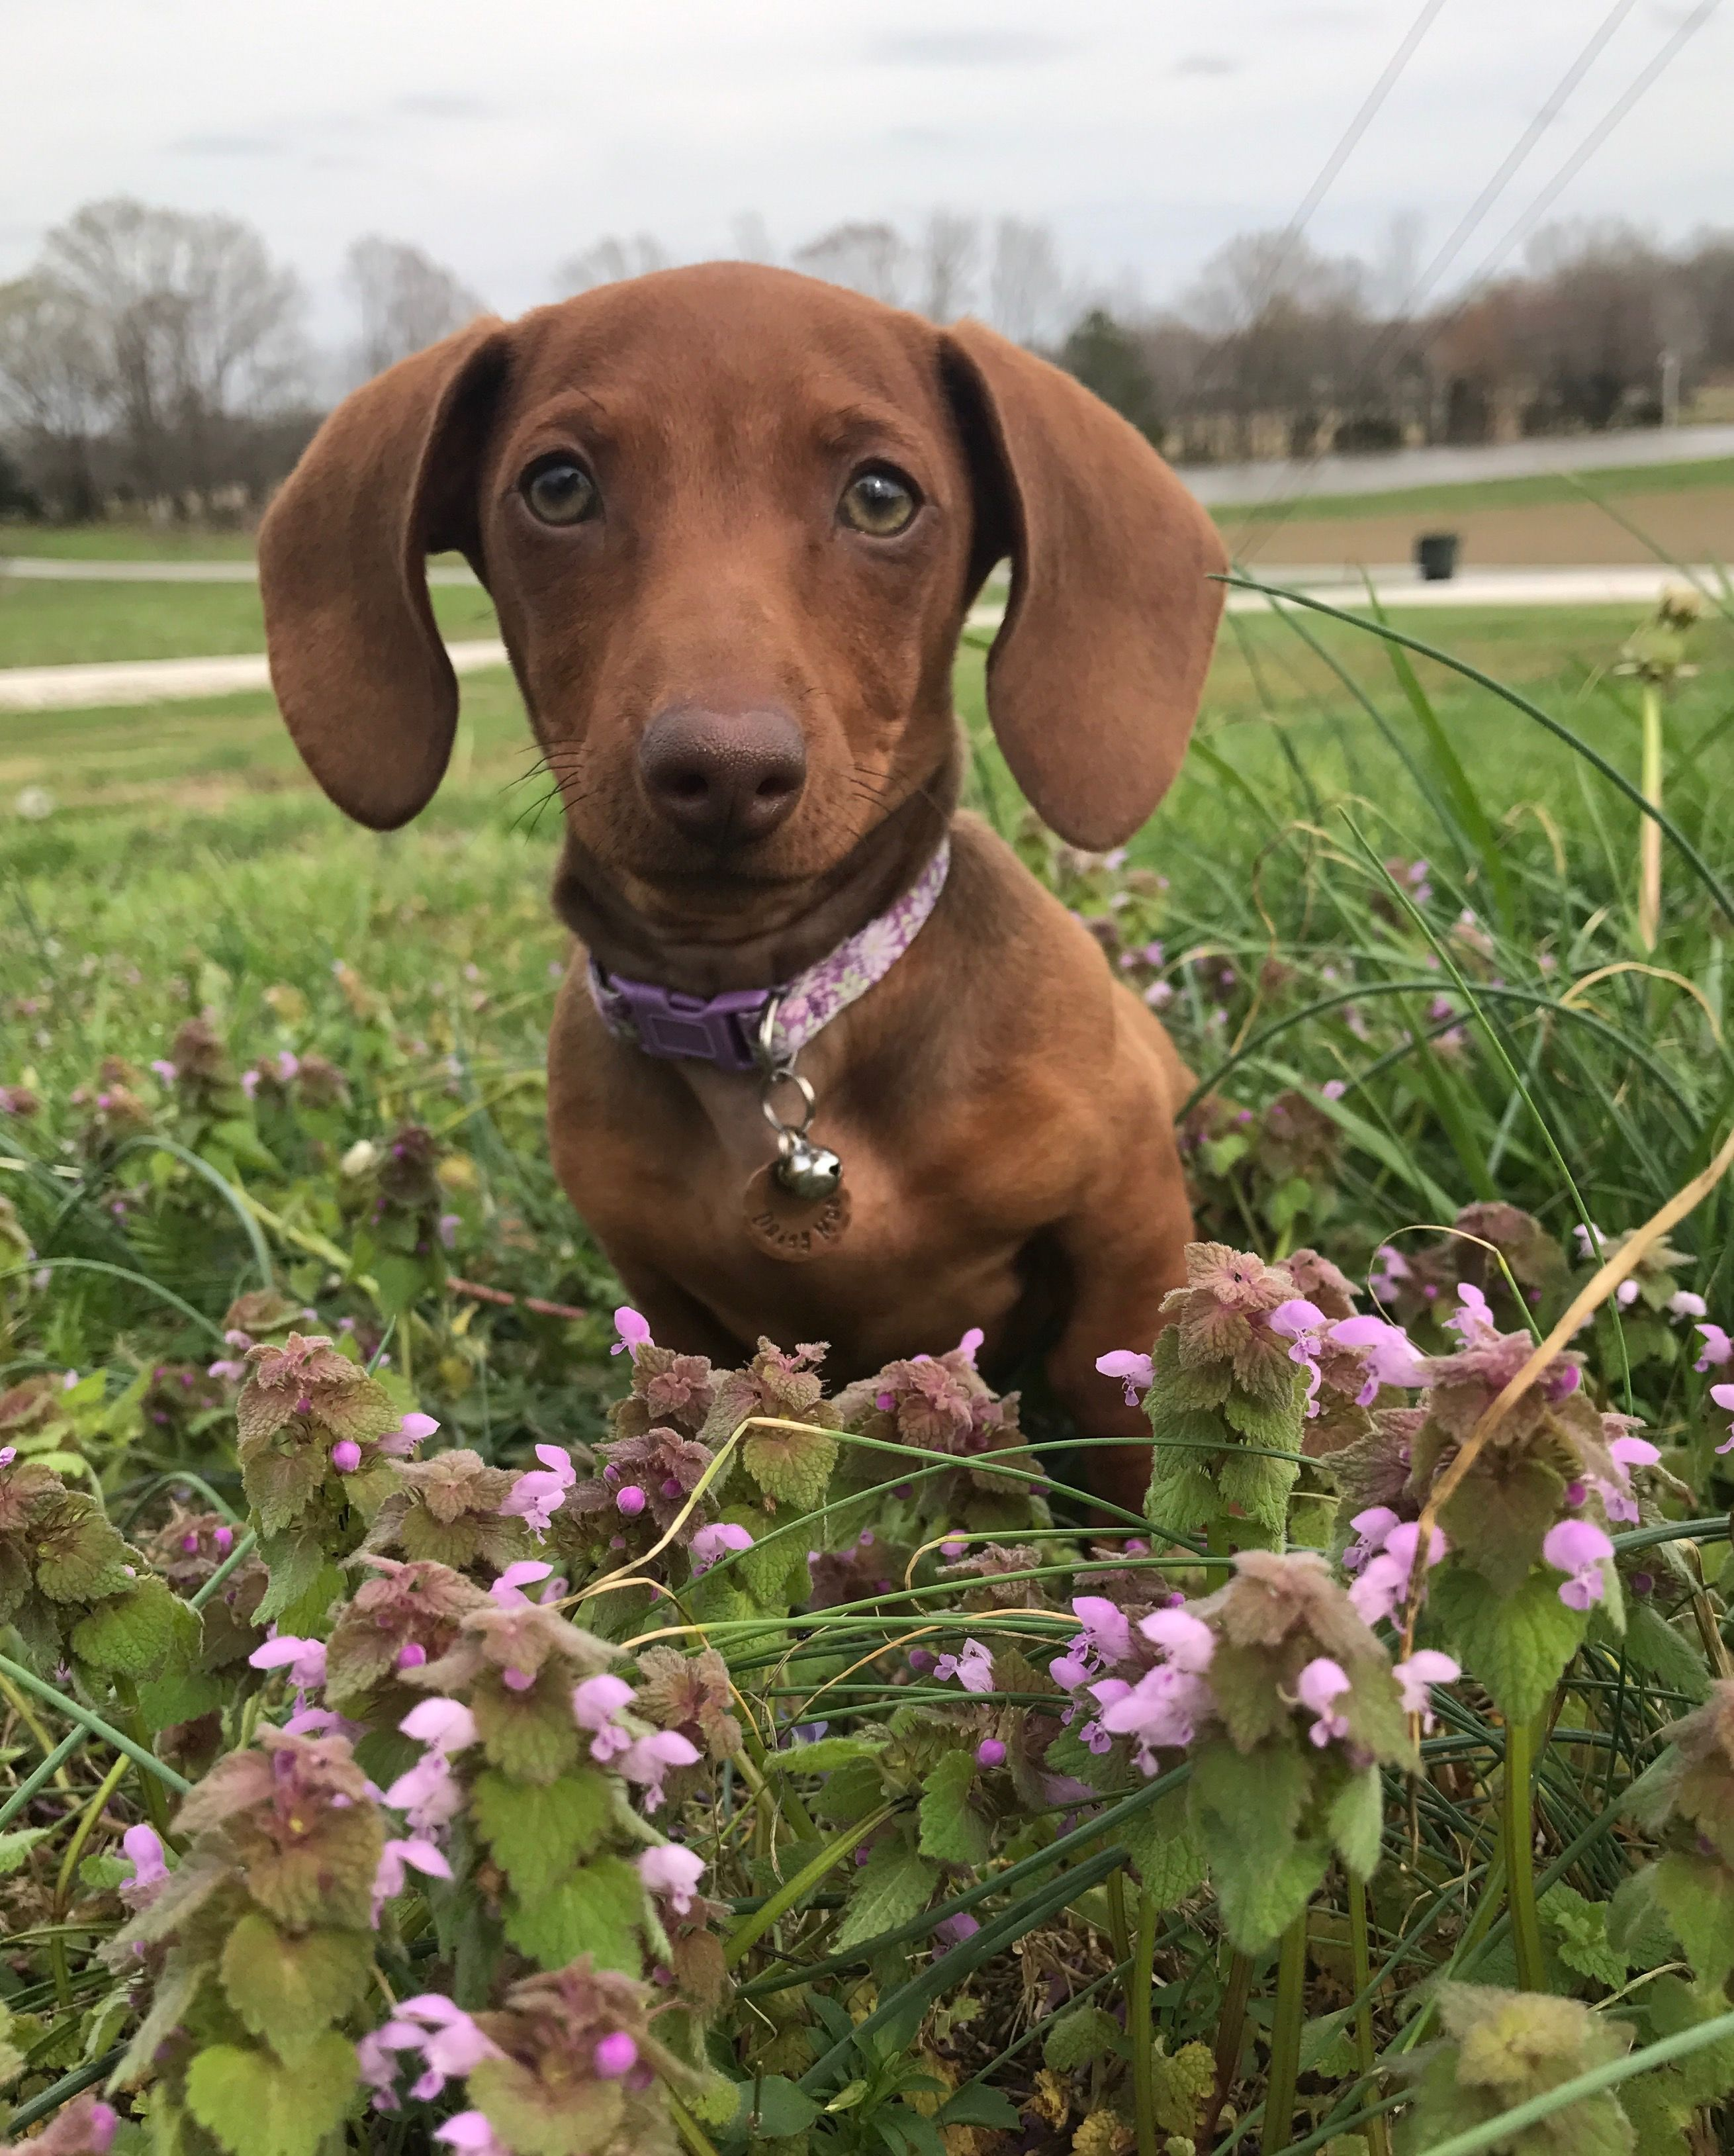 Daisy Mae 15 Weeks Old Dachshund Puppy Green Eyes Short Haired